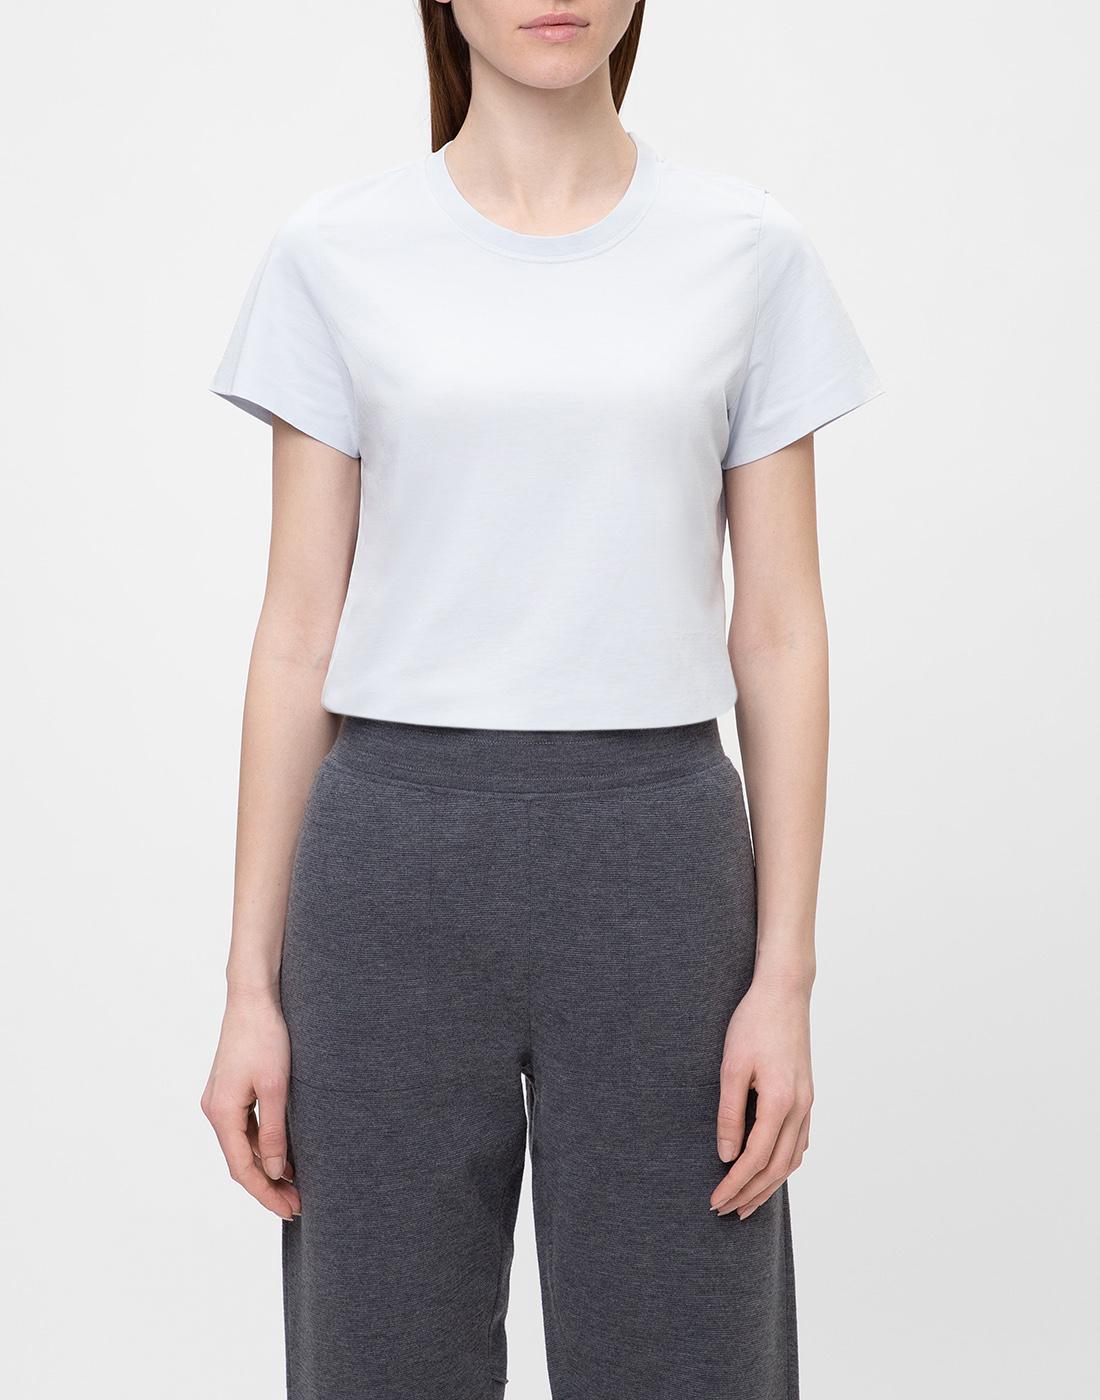 Женская голубая футболка  Dorothee Schumacher S623001/801-2